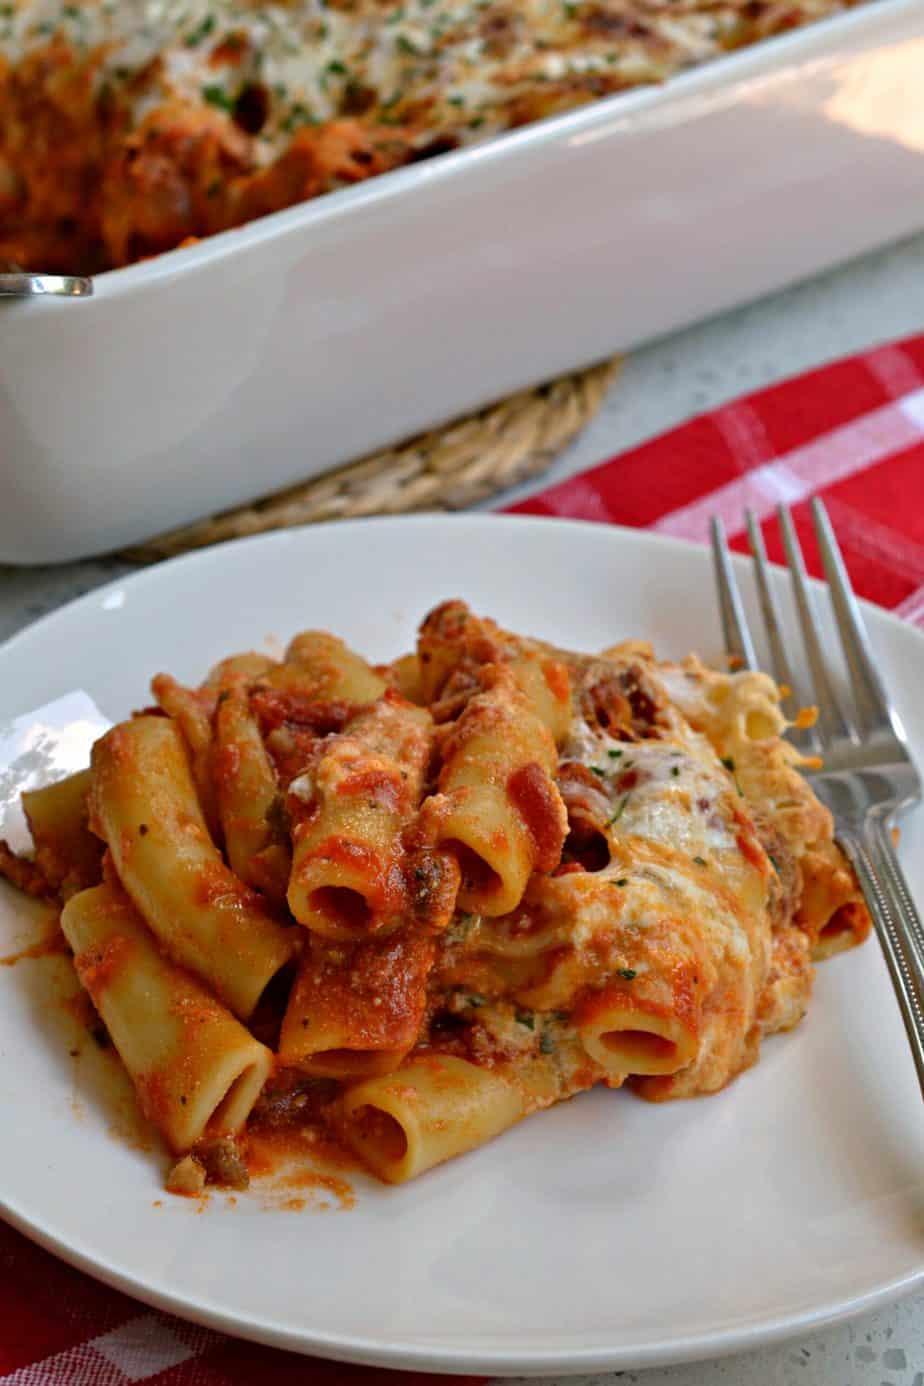 This Baked Ziti recipe is layered with Italian sausage, ricotta cheese, sweet marinara sauce and plenty of mozzarella.